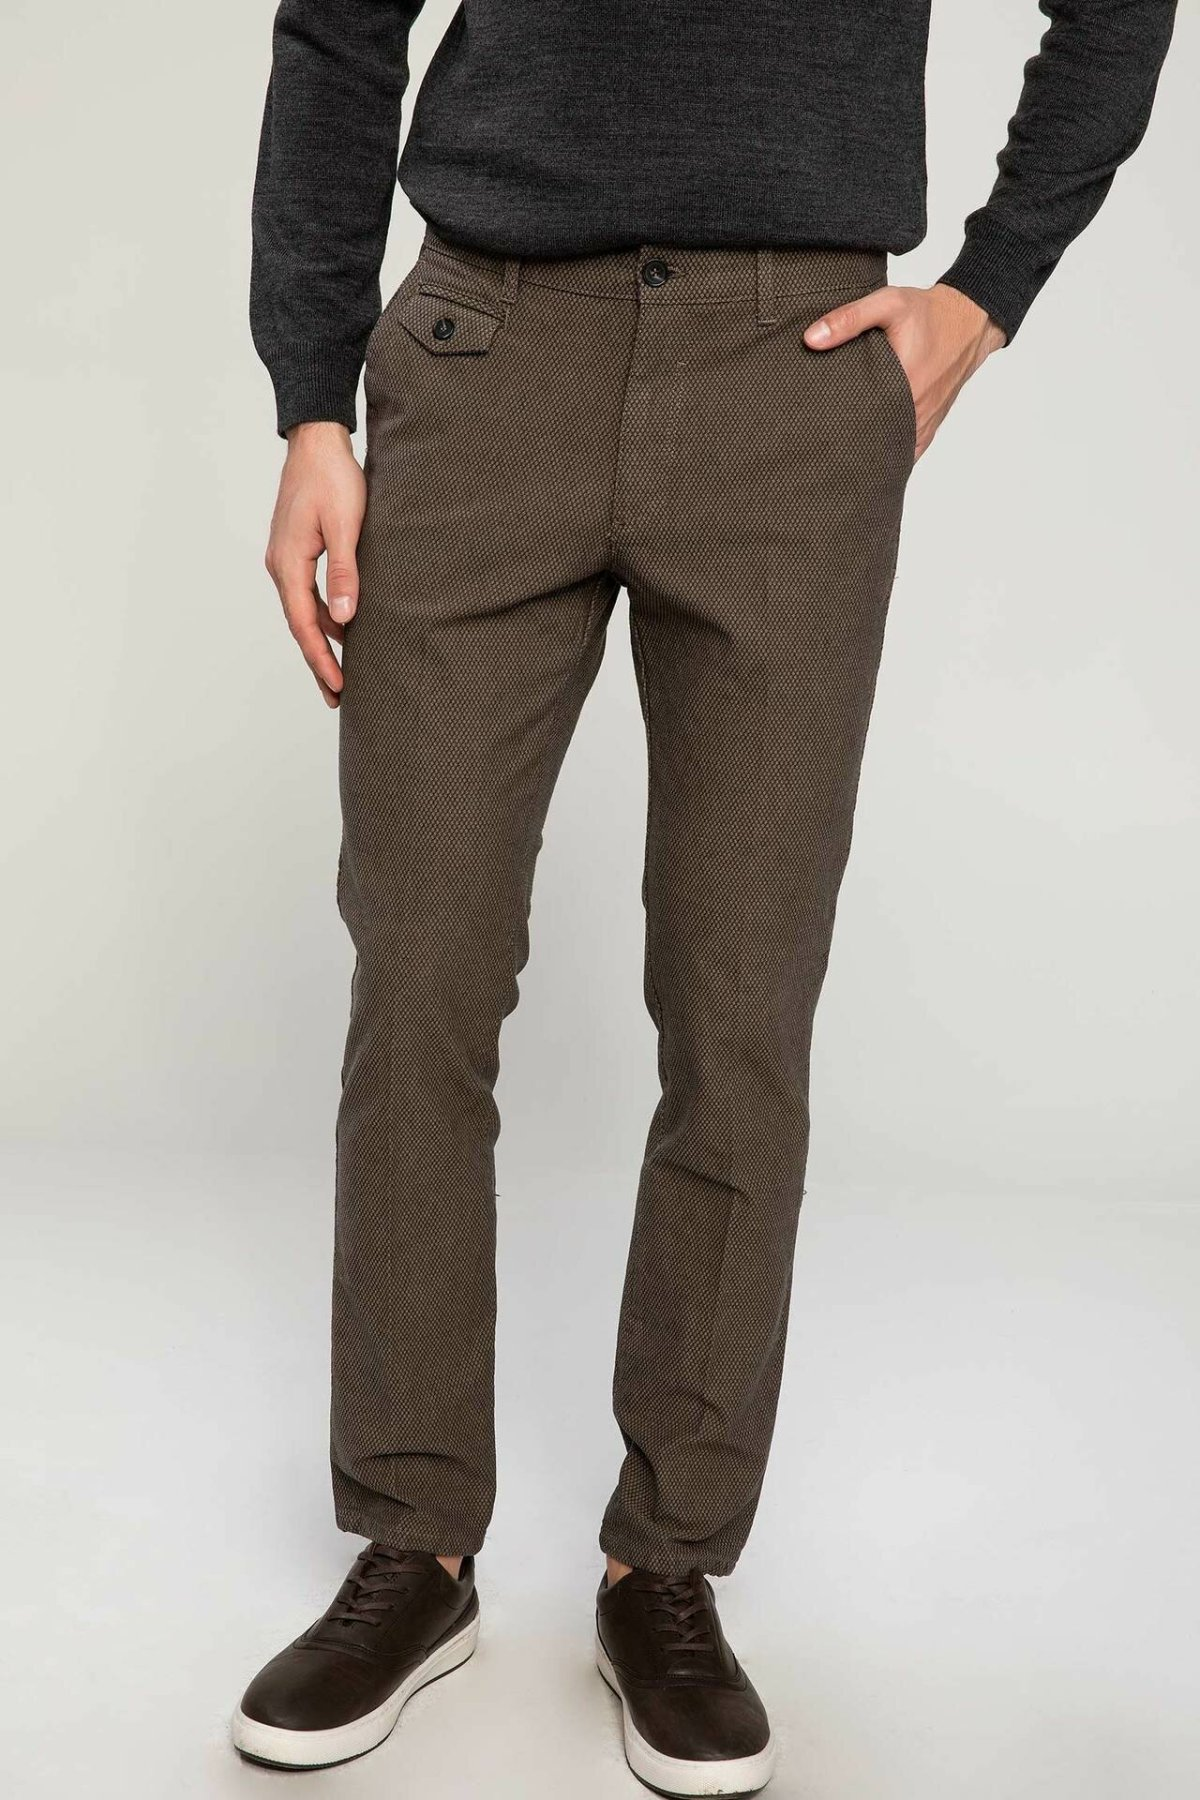 DeFacto Men Fashion Cargo Pants Button Casual Trousers Loose Straight Leisure For Men's Cotton Trousers New - J1534AZ18WN